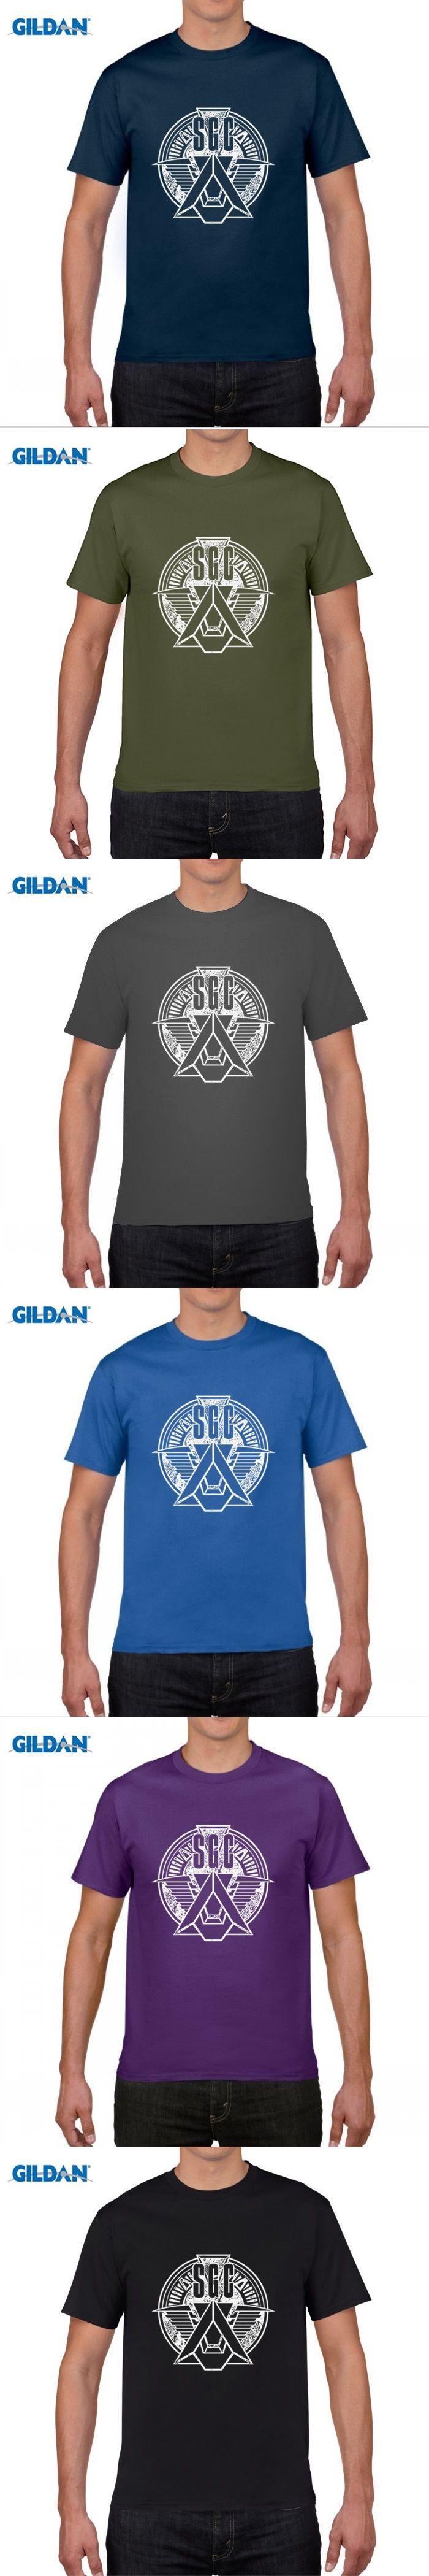 GILDAN pure cotton round collar T-shirt  Custom T Shirts Cheap Short Stargate Military Men Printing O-neck Shirt